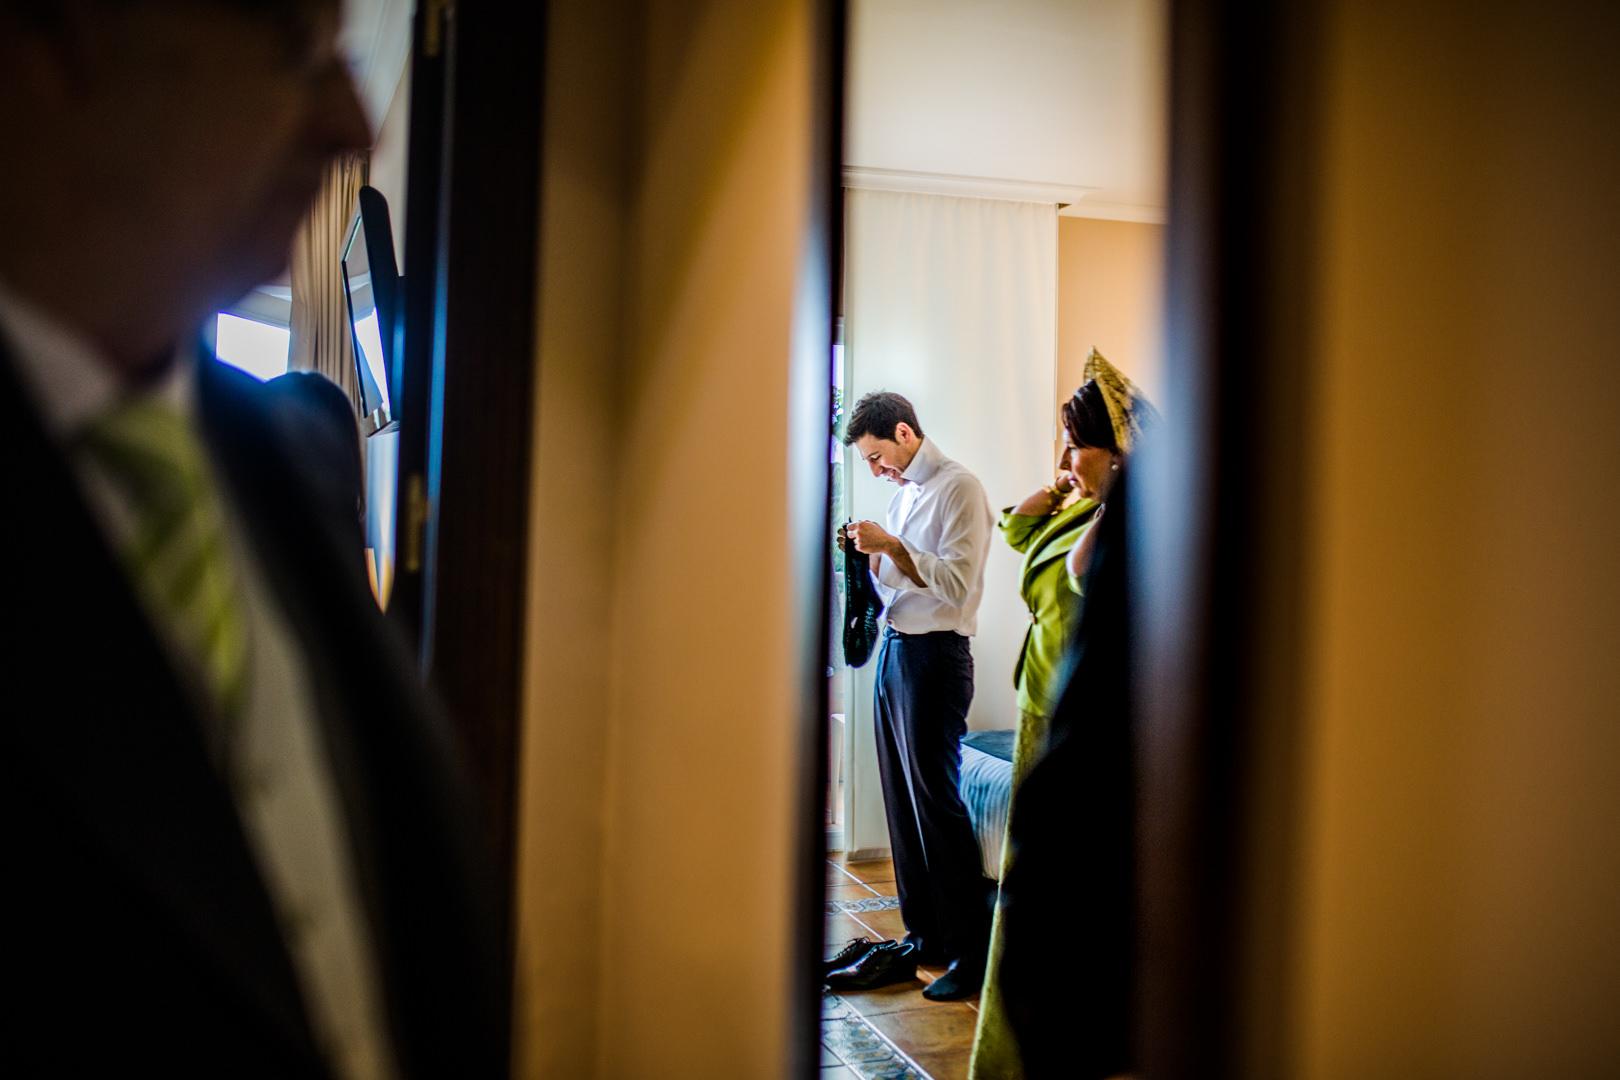 Boda-Catedral-Jaen-Hamburgo-Maria-David-engagement-Rafael-Torres-fotografo-bodas-sevilla-madrid-barcelona-wedding-photographer--3.jpg